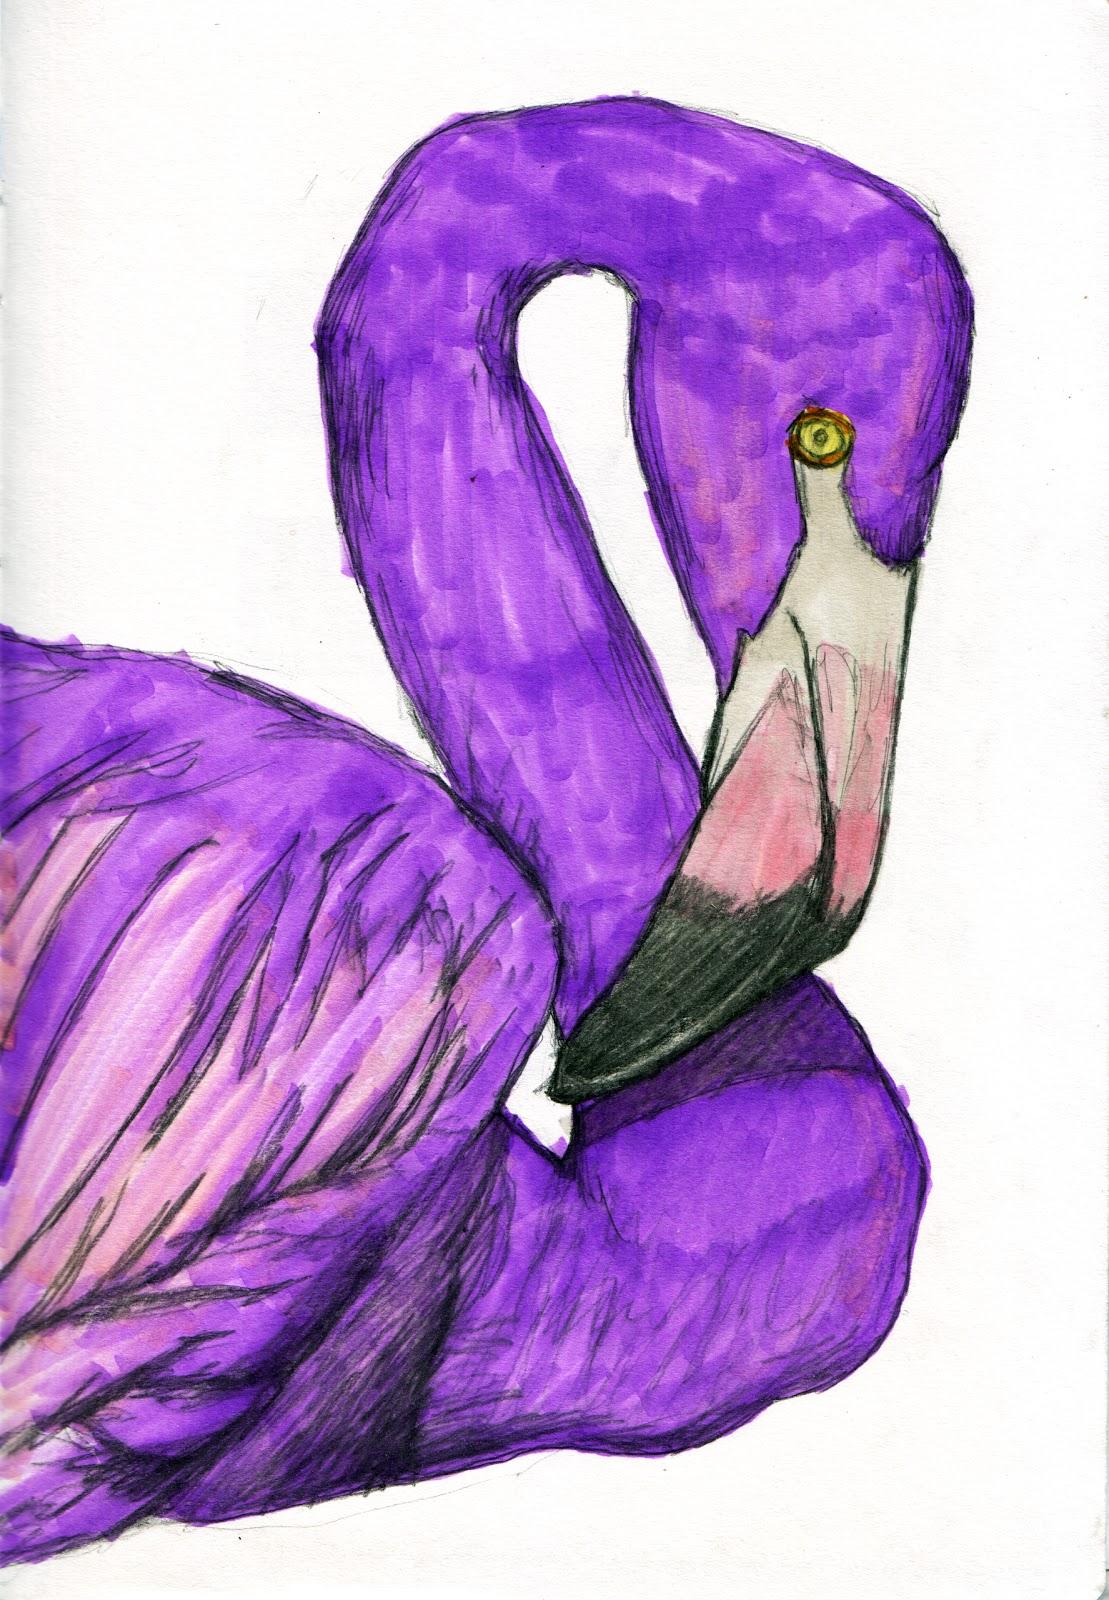 THE OPPOSITE MACHINE: Moving toward Purple